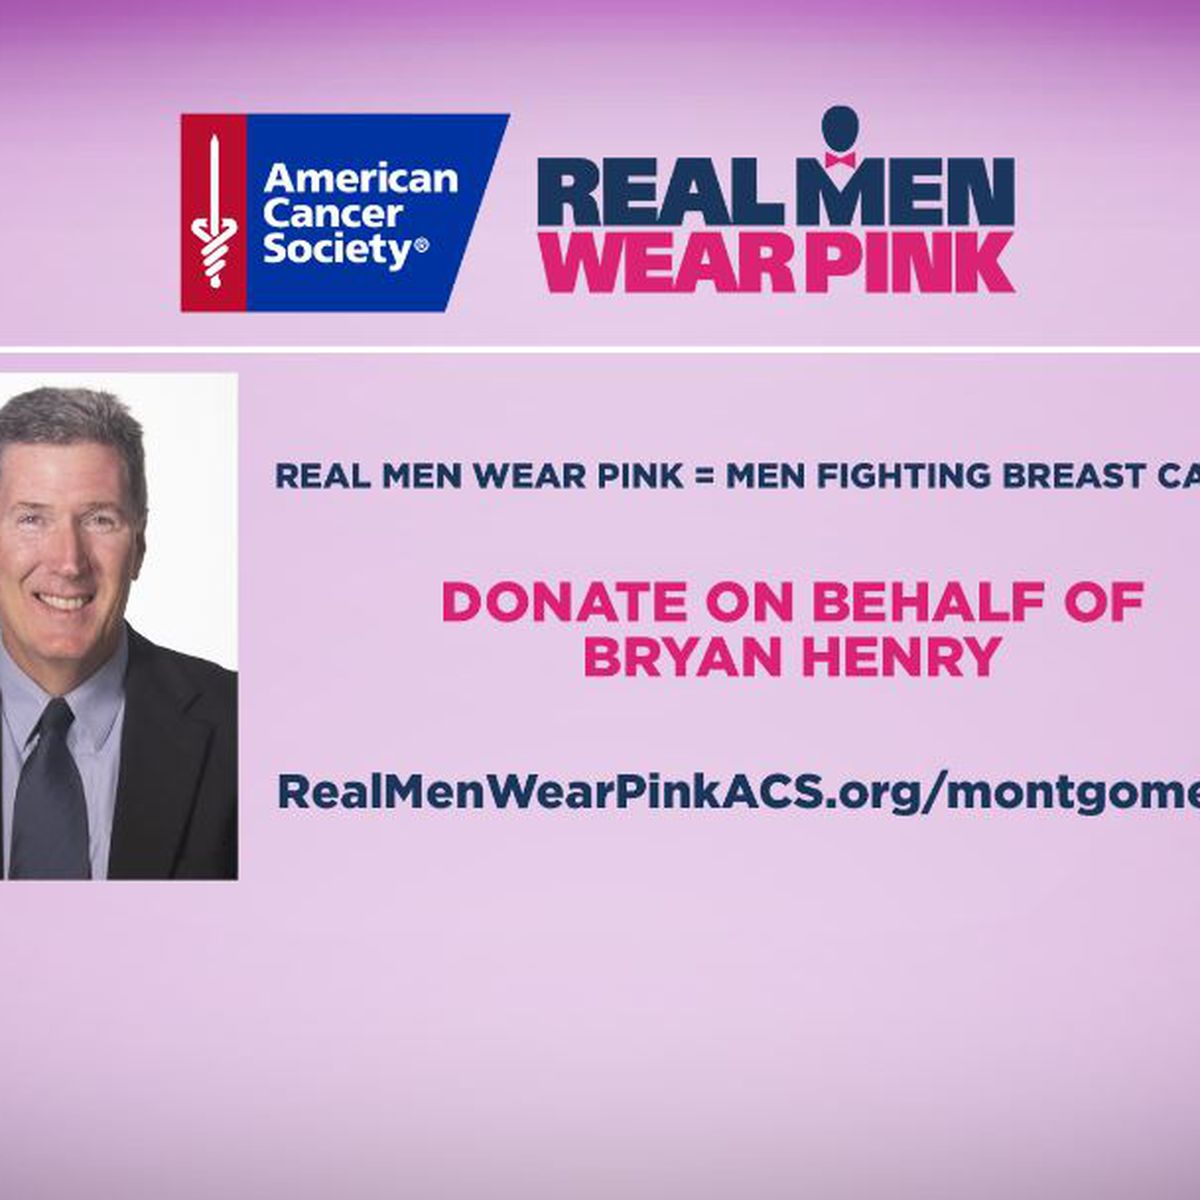 WSFA's Bryan Henry dons pink attire to raise money, awareness